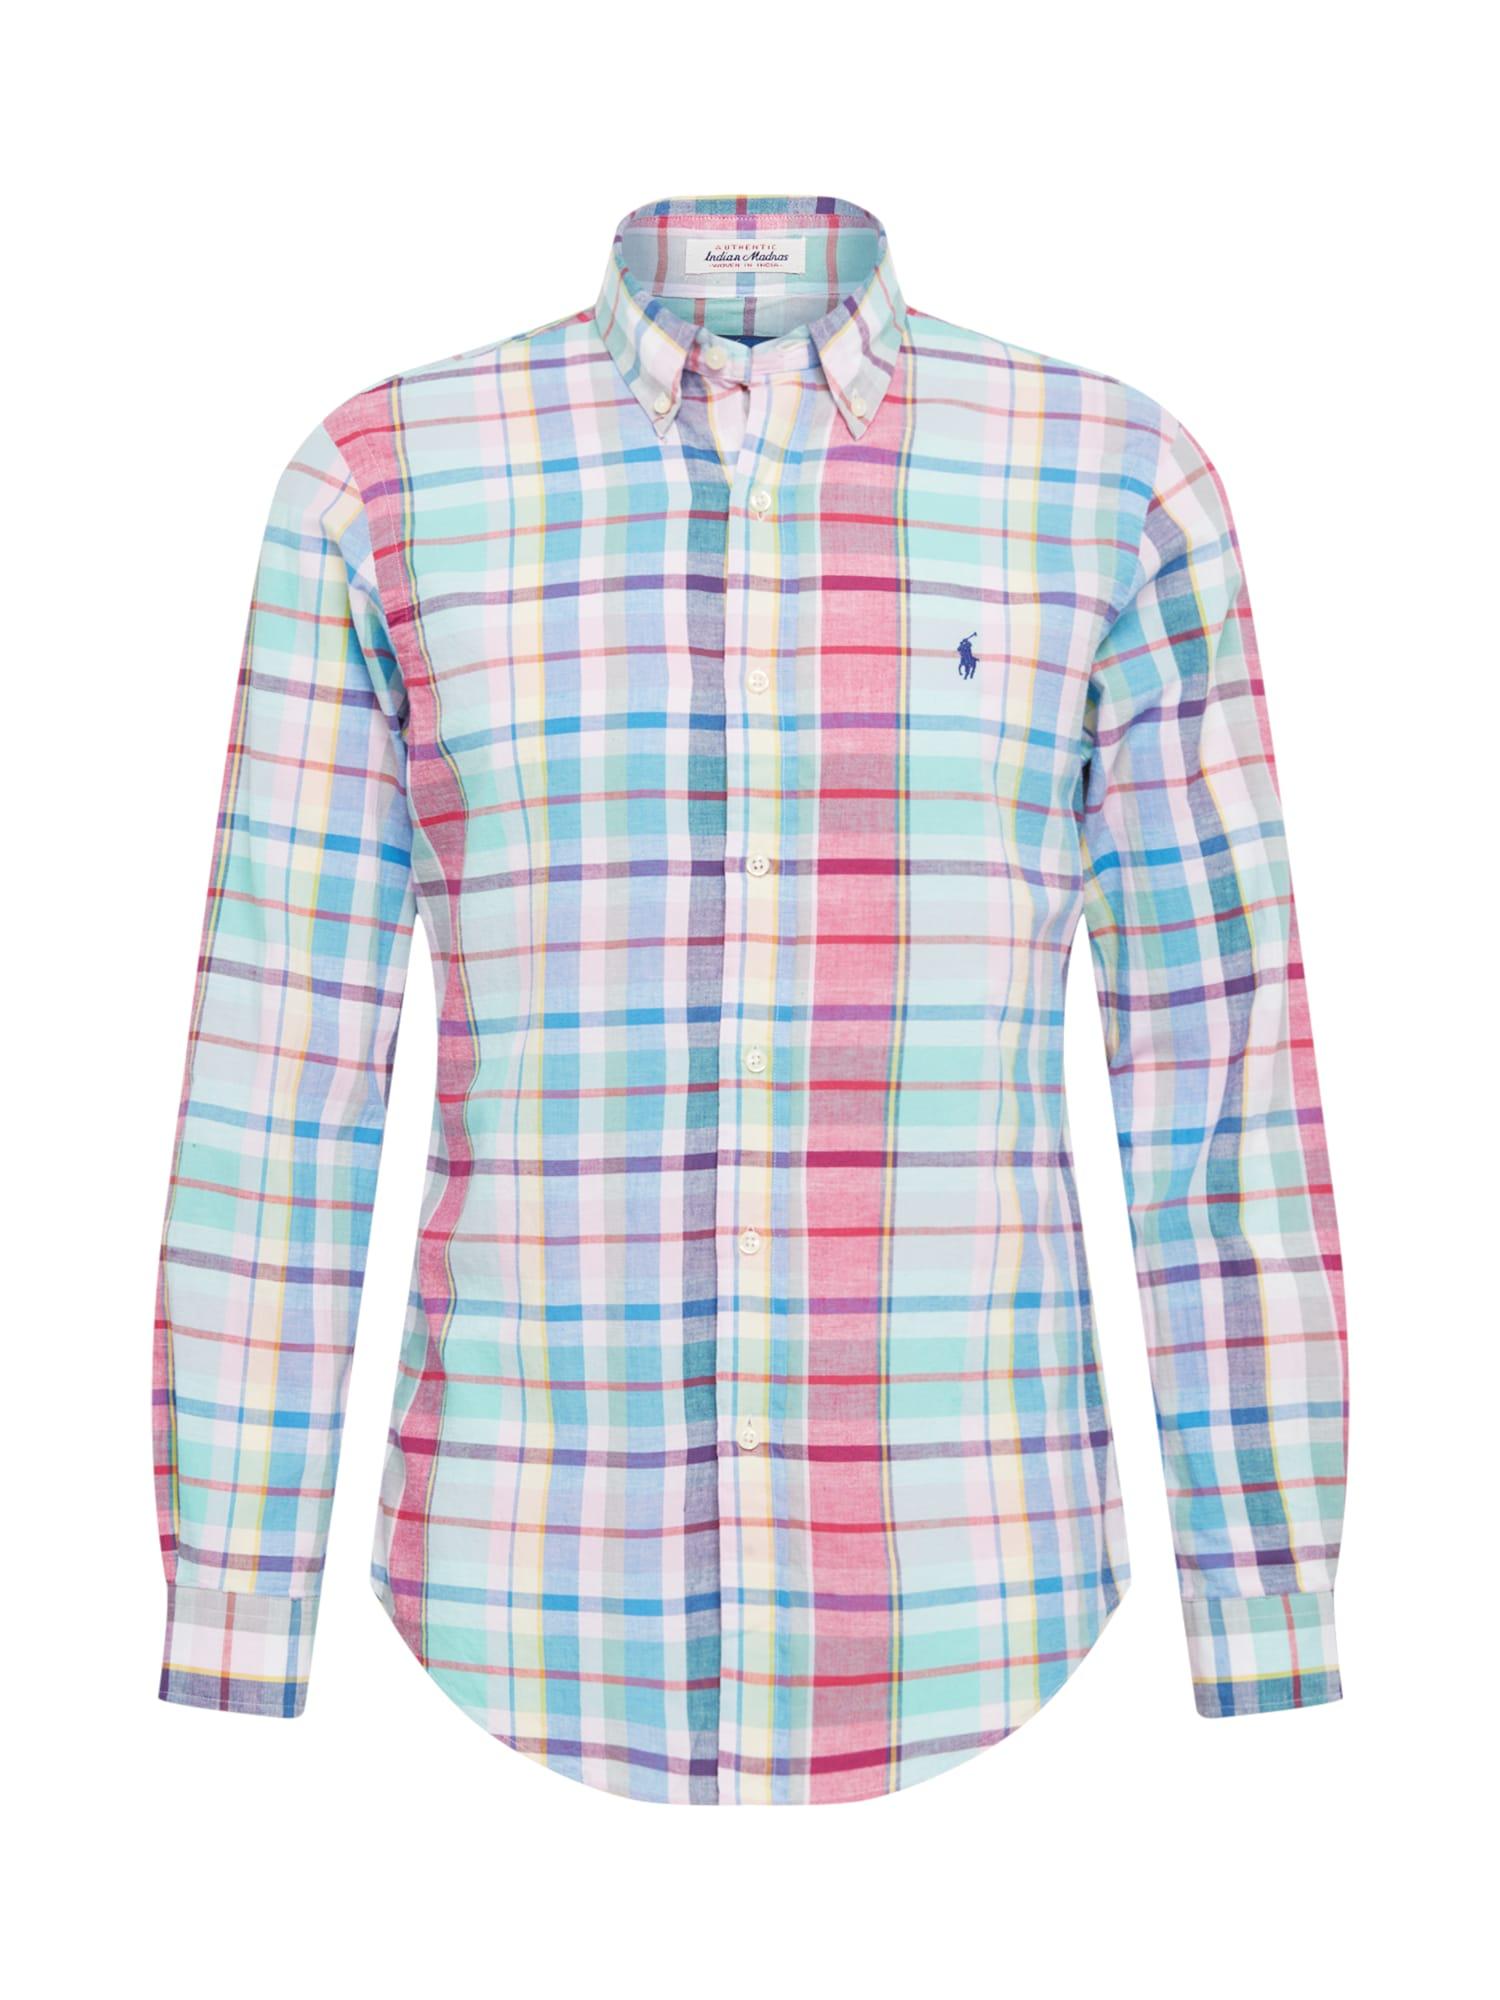 POLO RALPH LAUREN Marškiniai